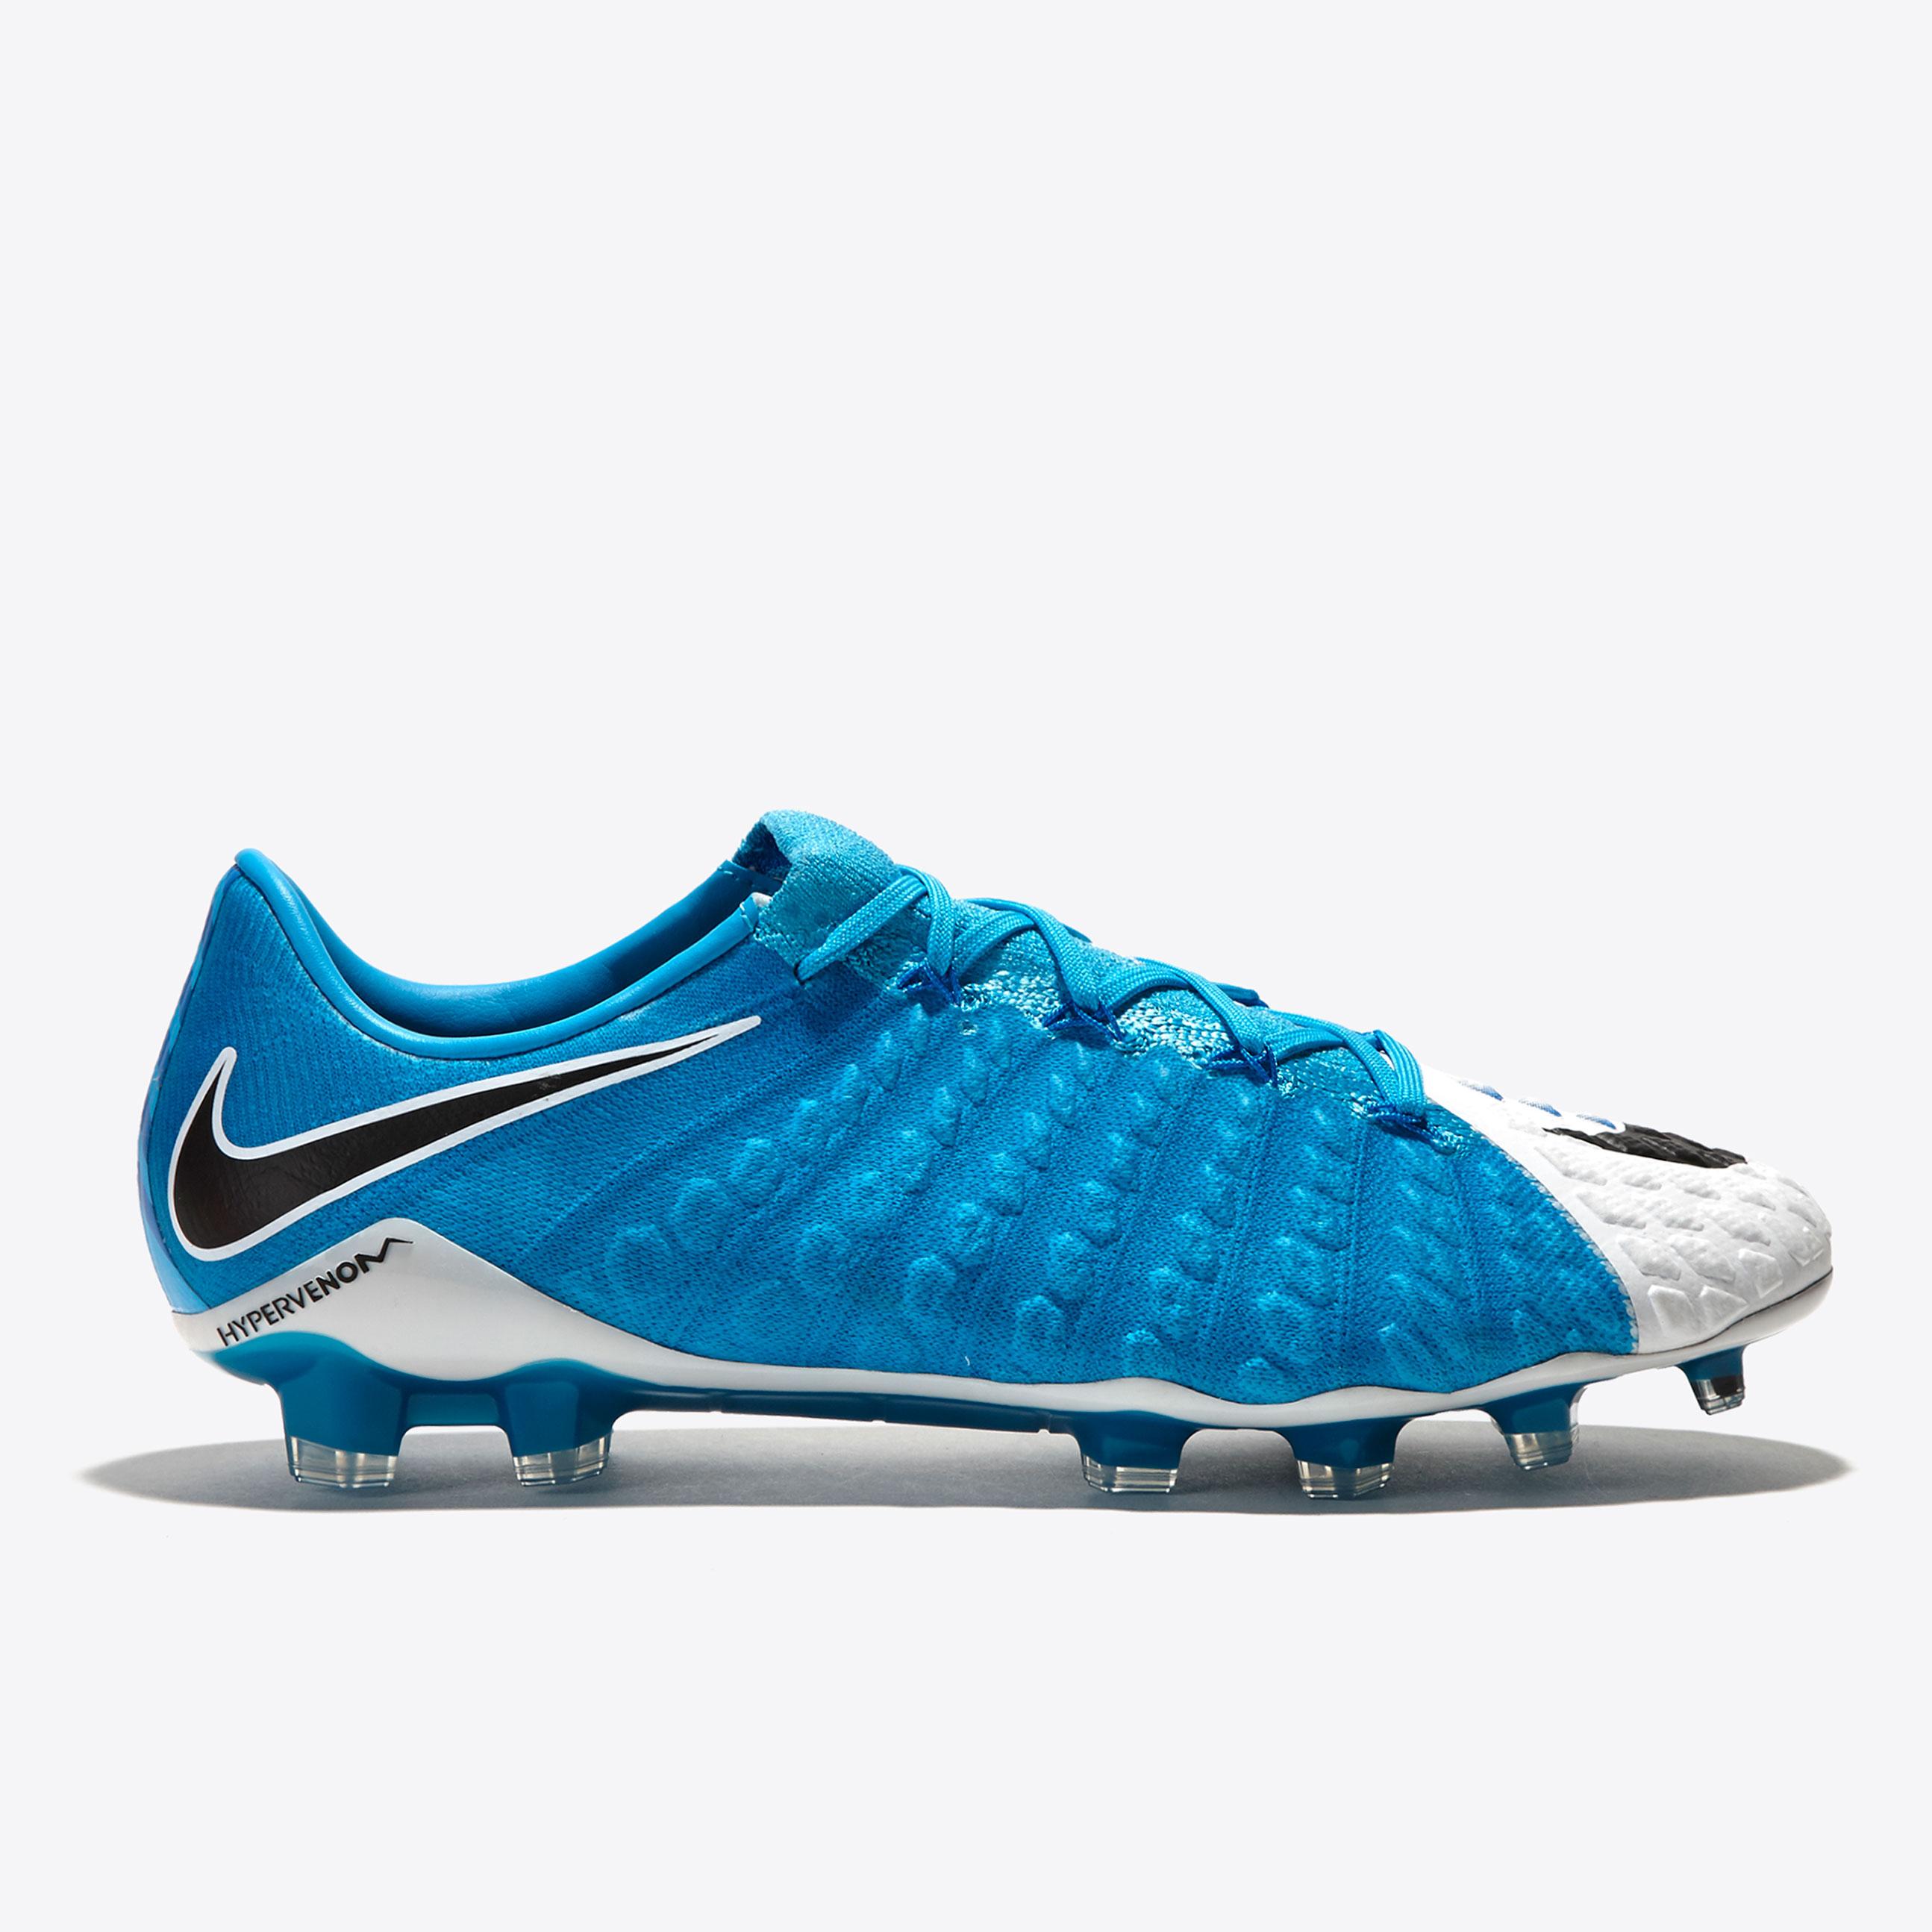 Nike Hypervenom Phantom III Firm Ground Football Boots - White/Black/P